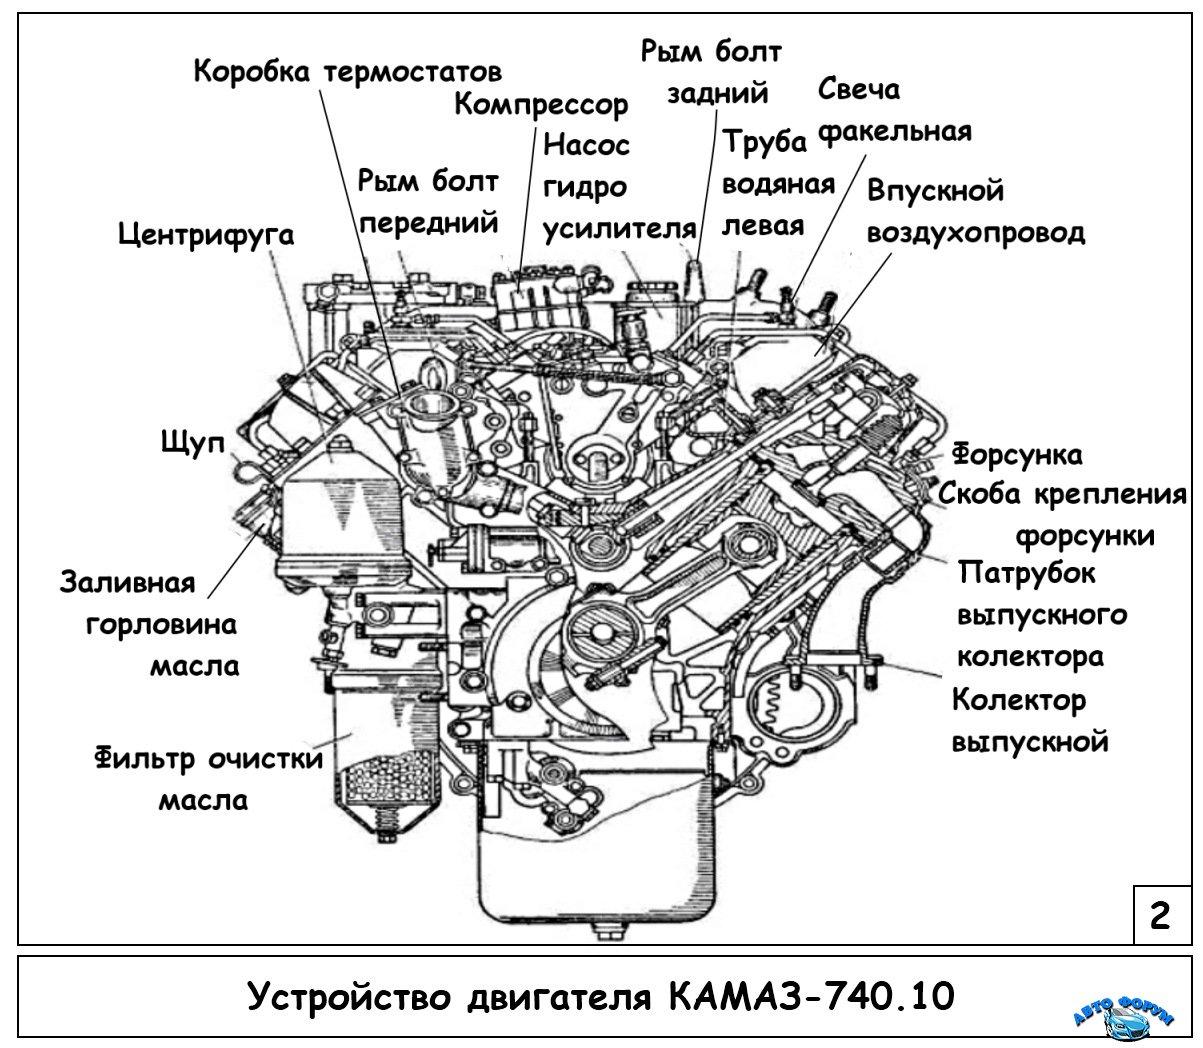 ustroistvo-dvigatelia-kamaz-2.jpg